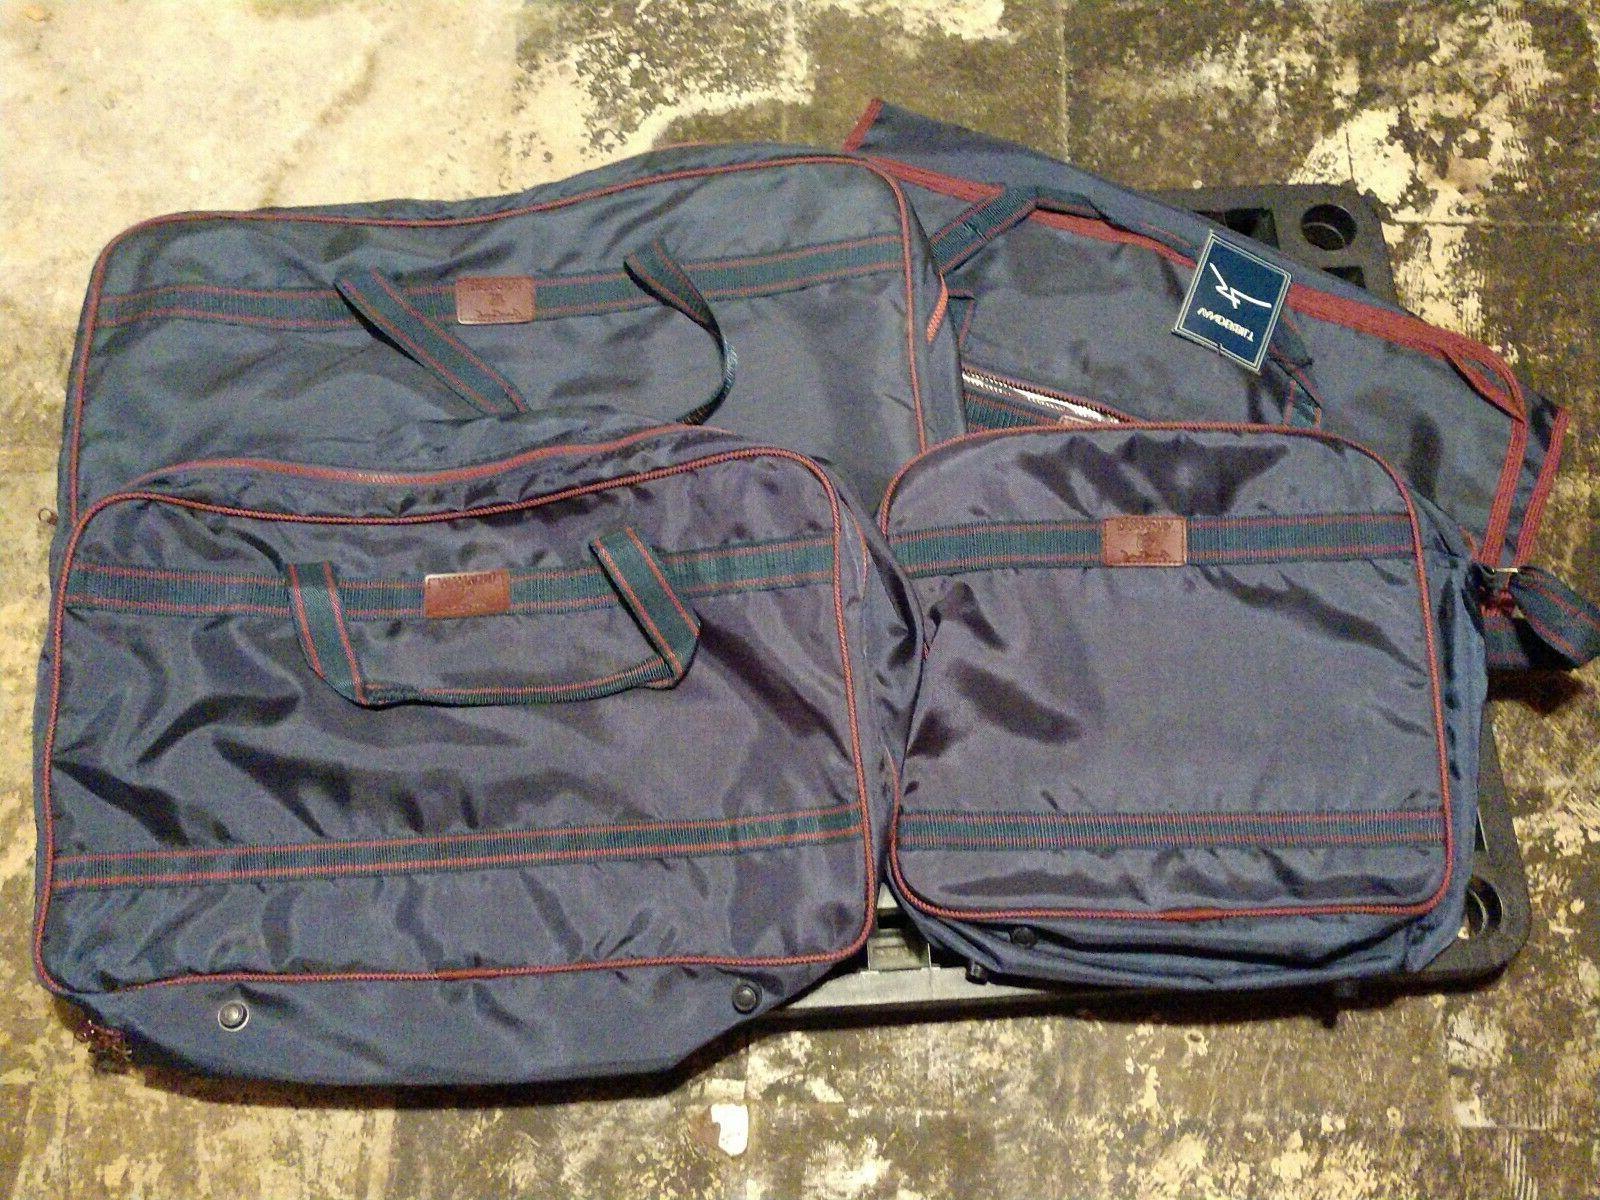 4 piece lightweight luggage set nos lock